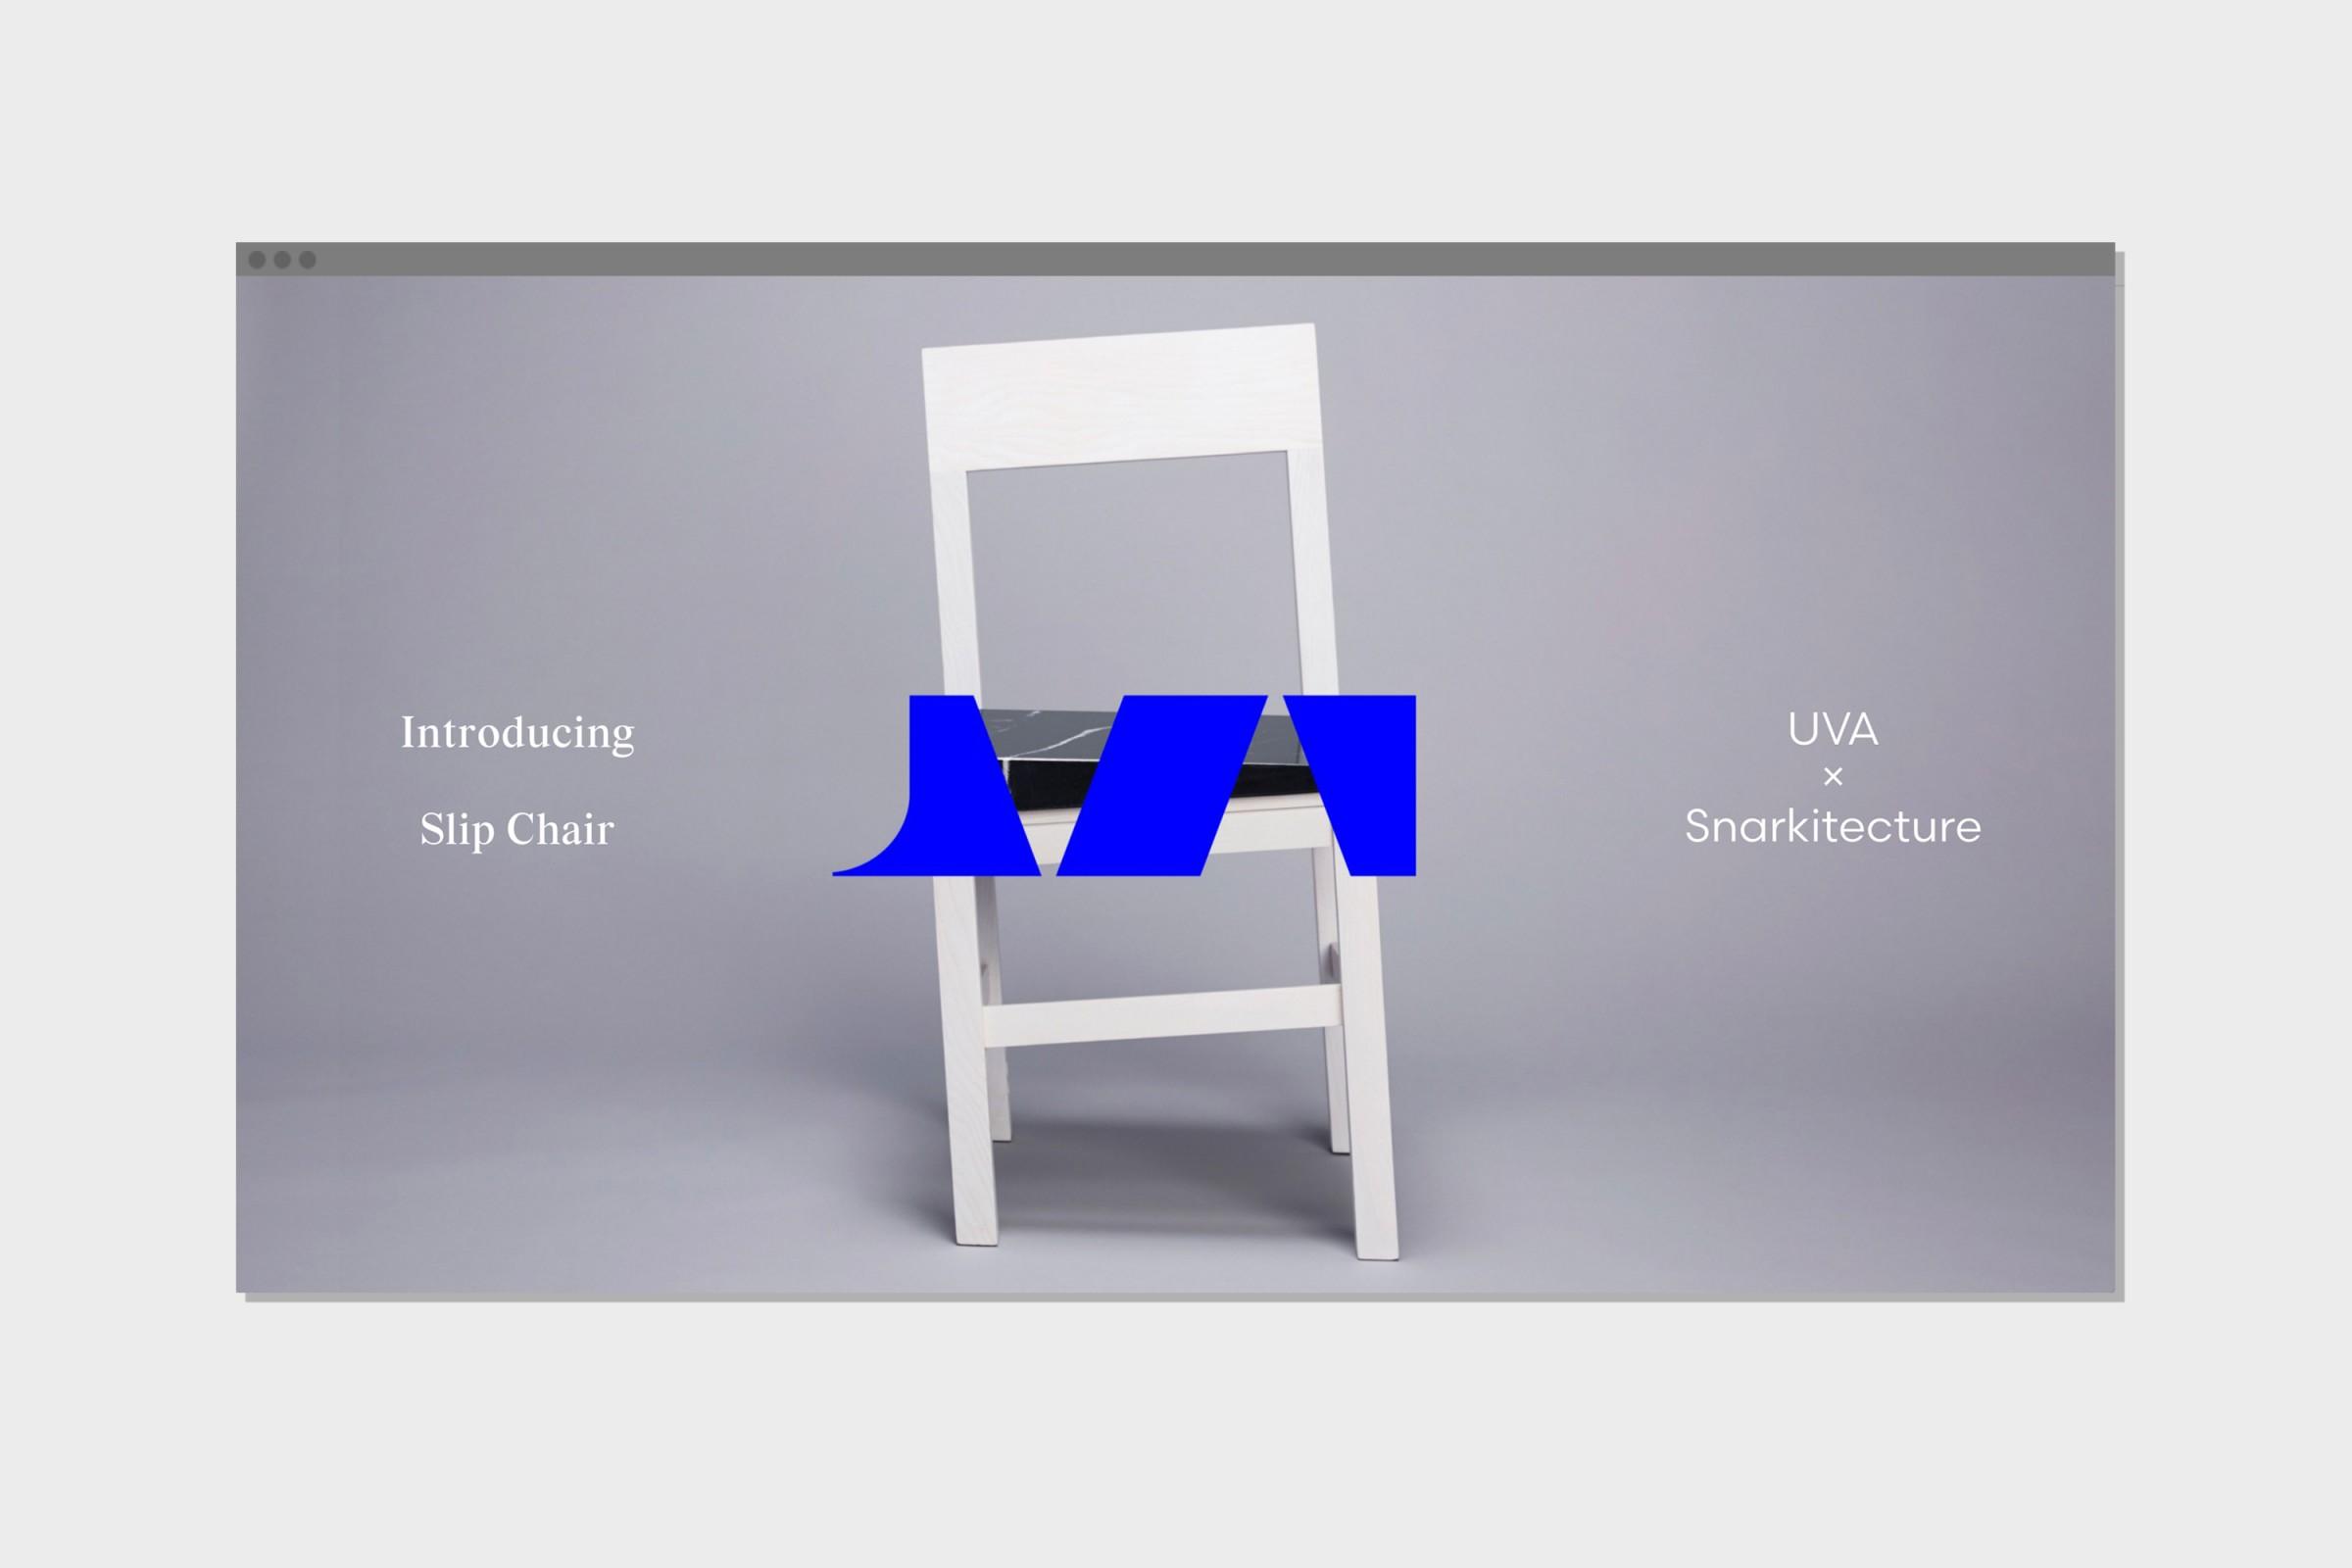 WeShouldDoItAll — UVA